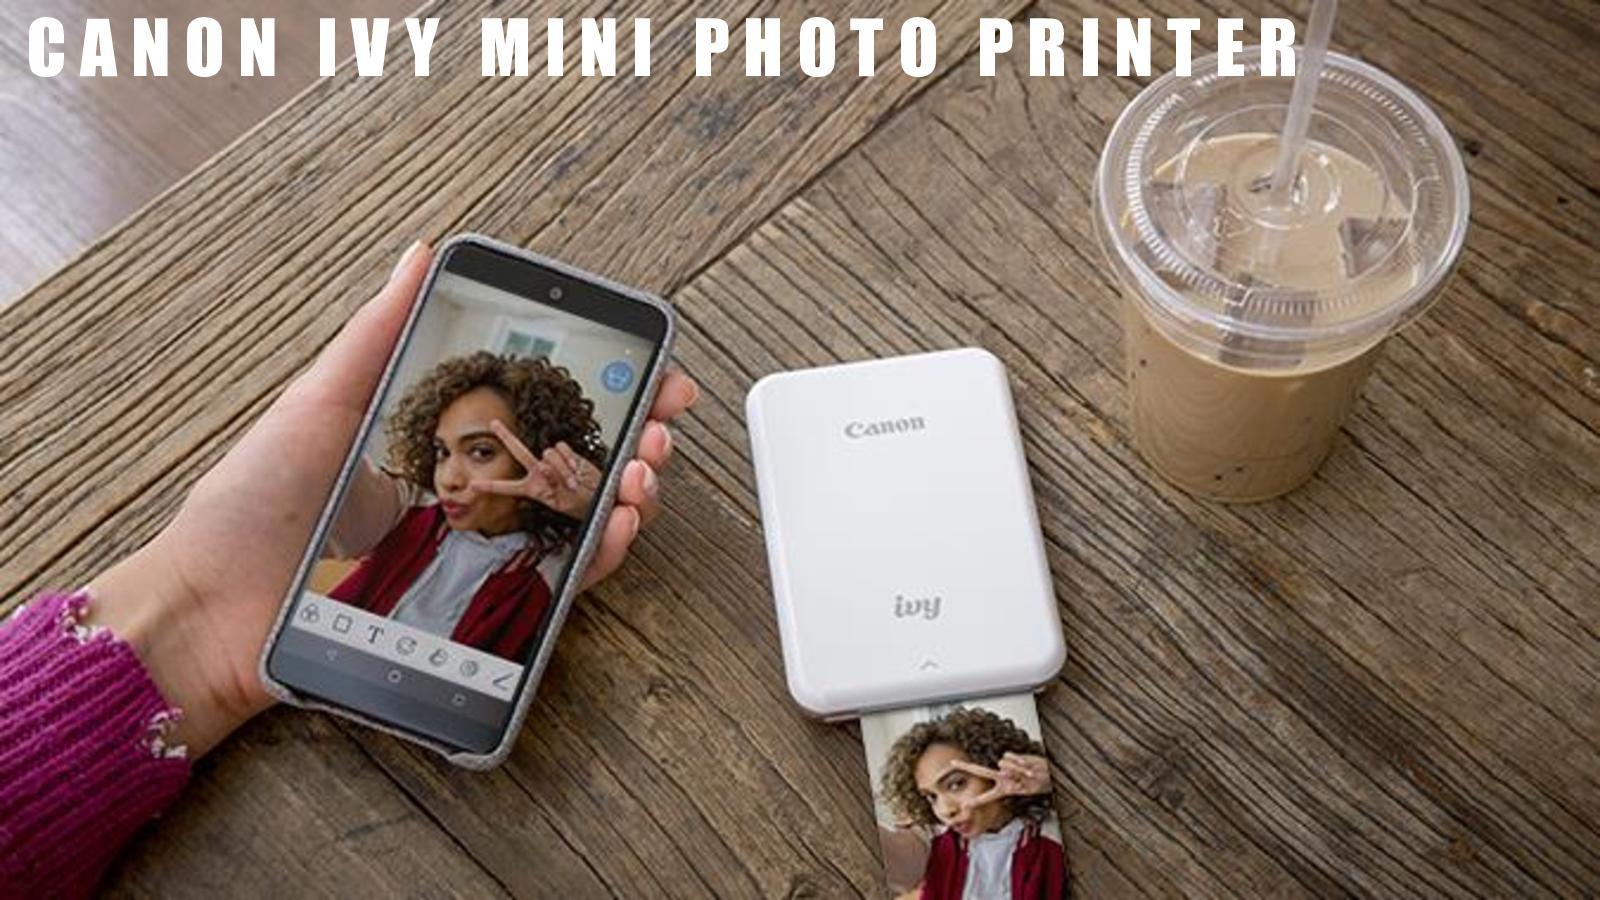 Canon ivy photo printer